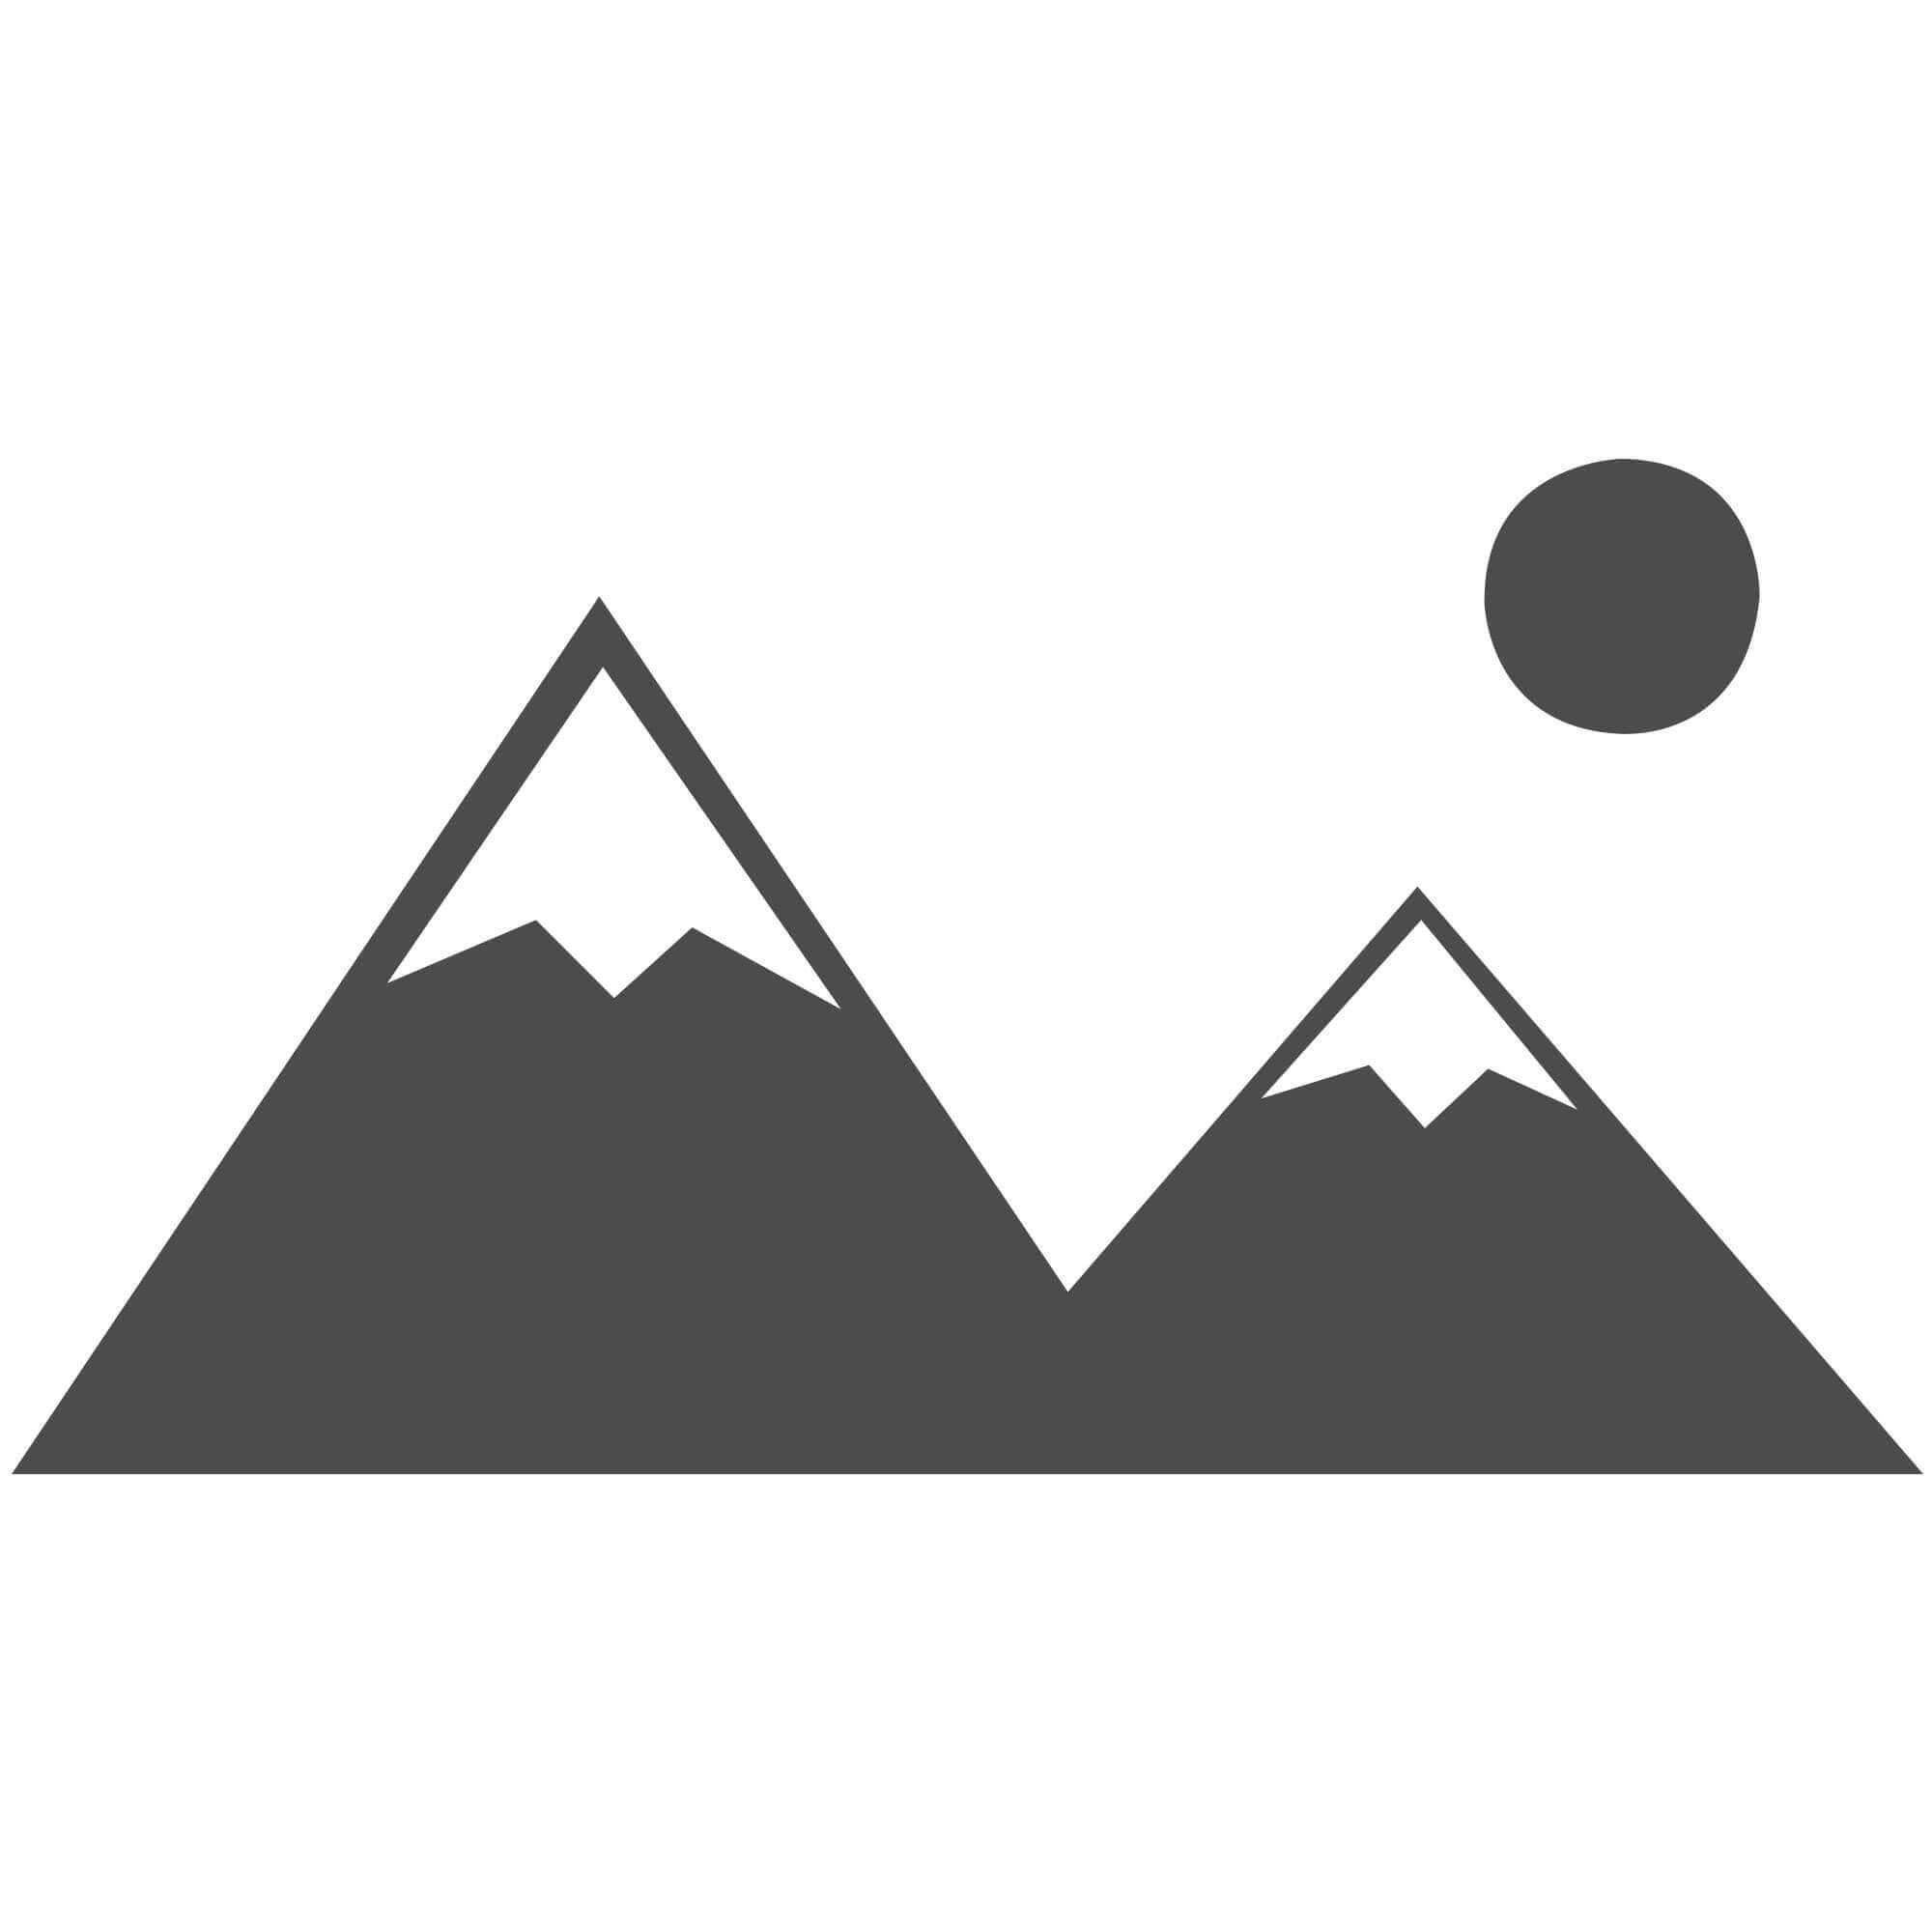 "Whisper Shaggy Rug - Mars Red - Size 140 x 200 cm (4'7"" x 6'7"")"